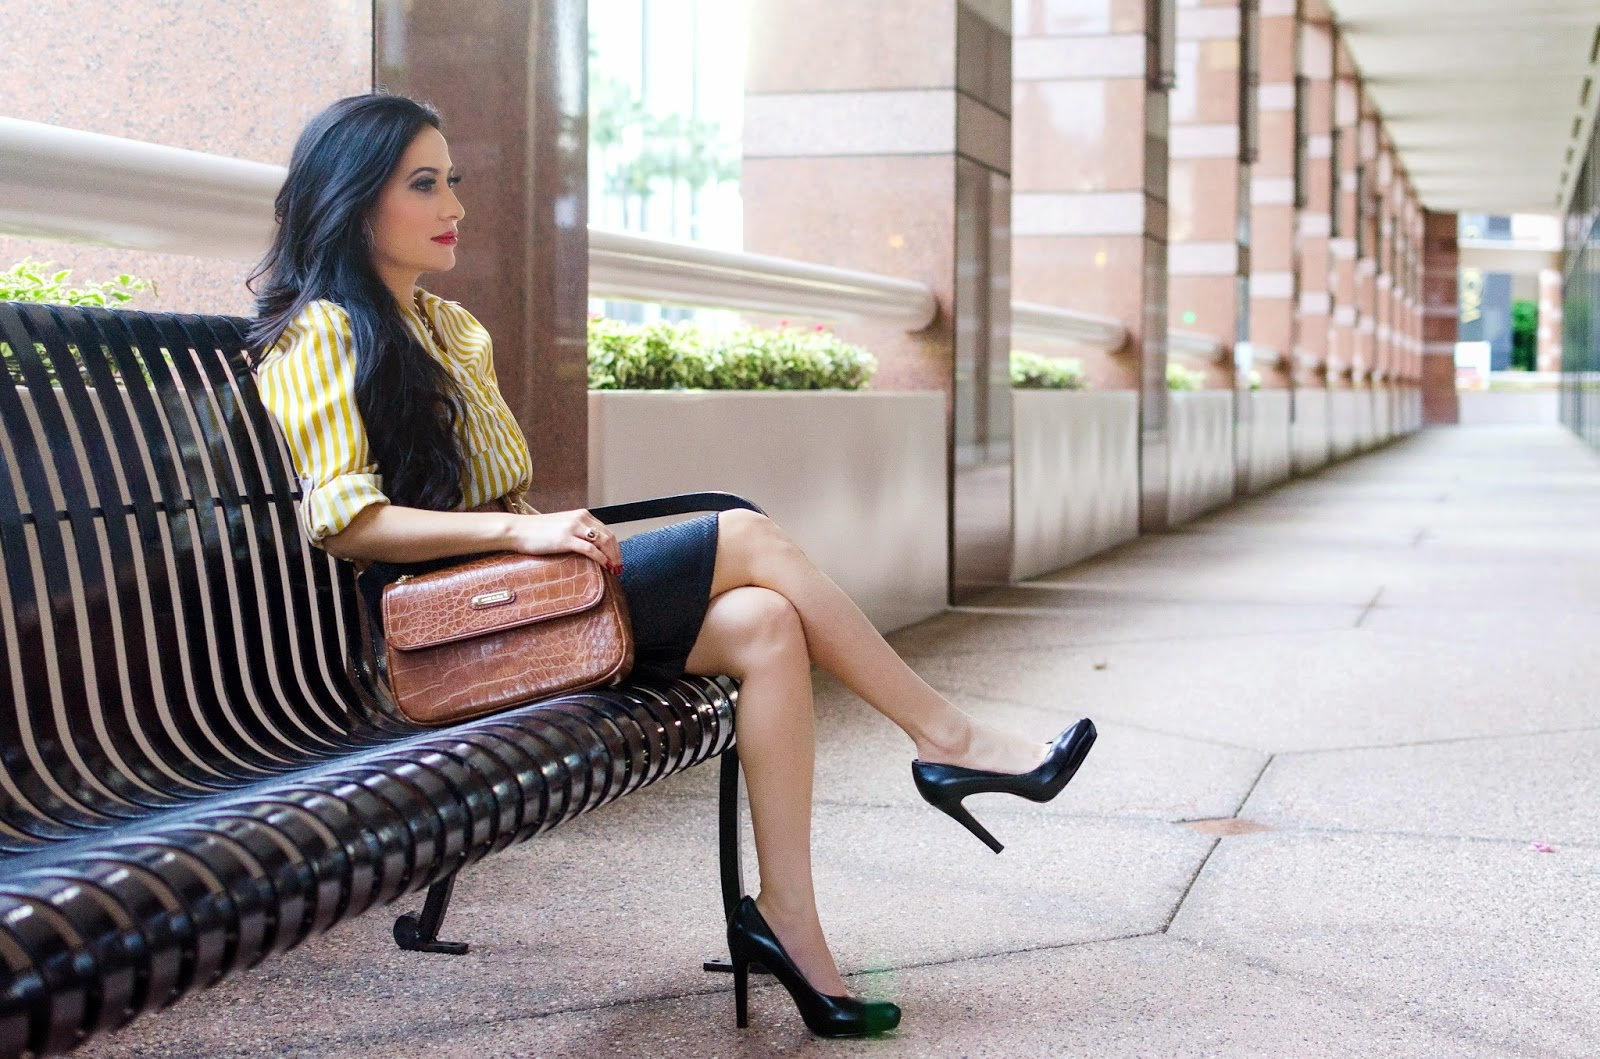 Striped Gold and White Shirt Anne Klein Brown Handbag Nine West Black High Heels St. Thomas Gold Link Necklace Leather Belt Olivaceous Black Python Print Pencil Skirt